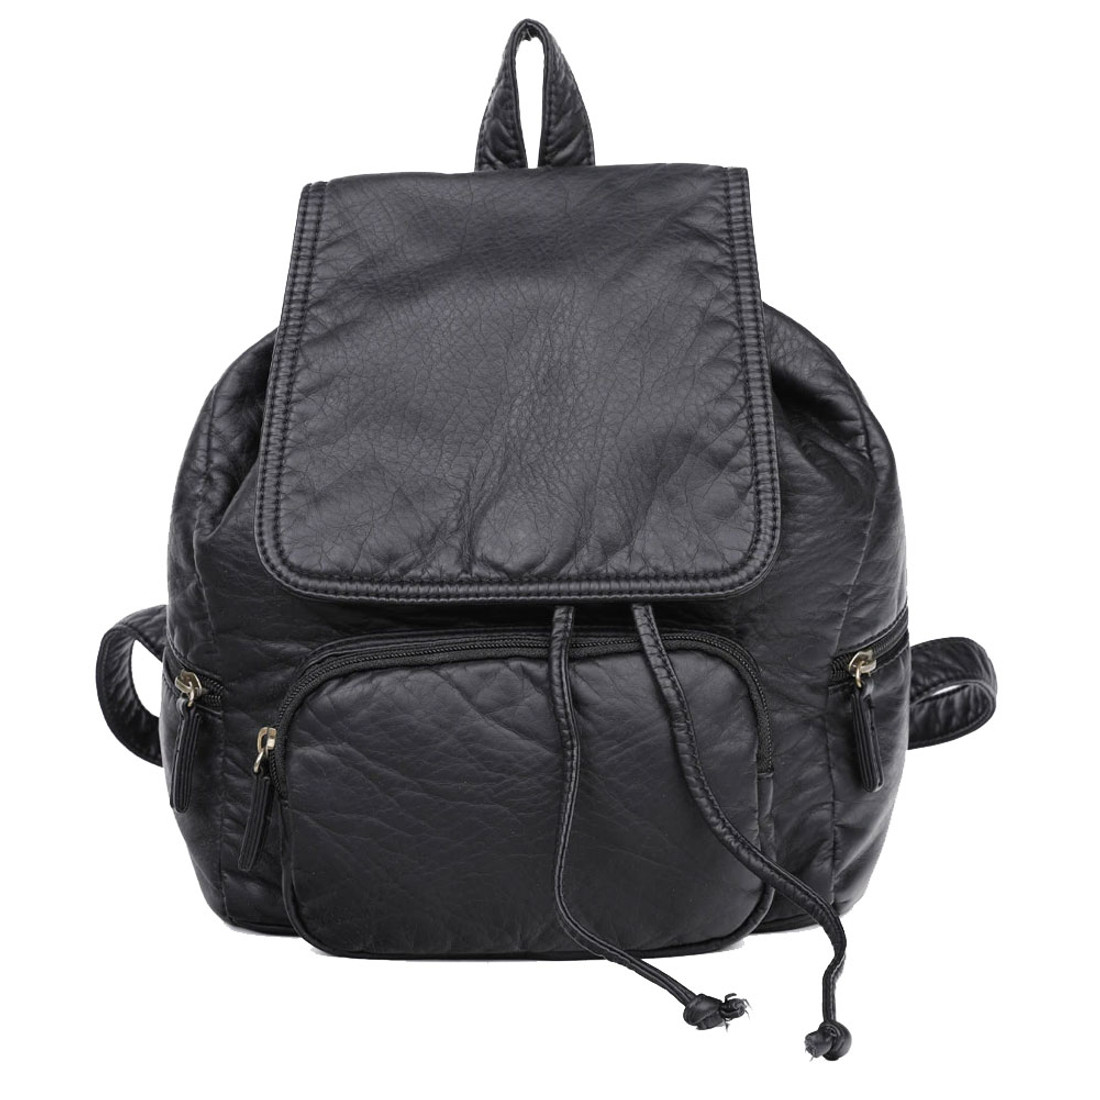 Vegan Leather Black Backpack Purse